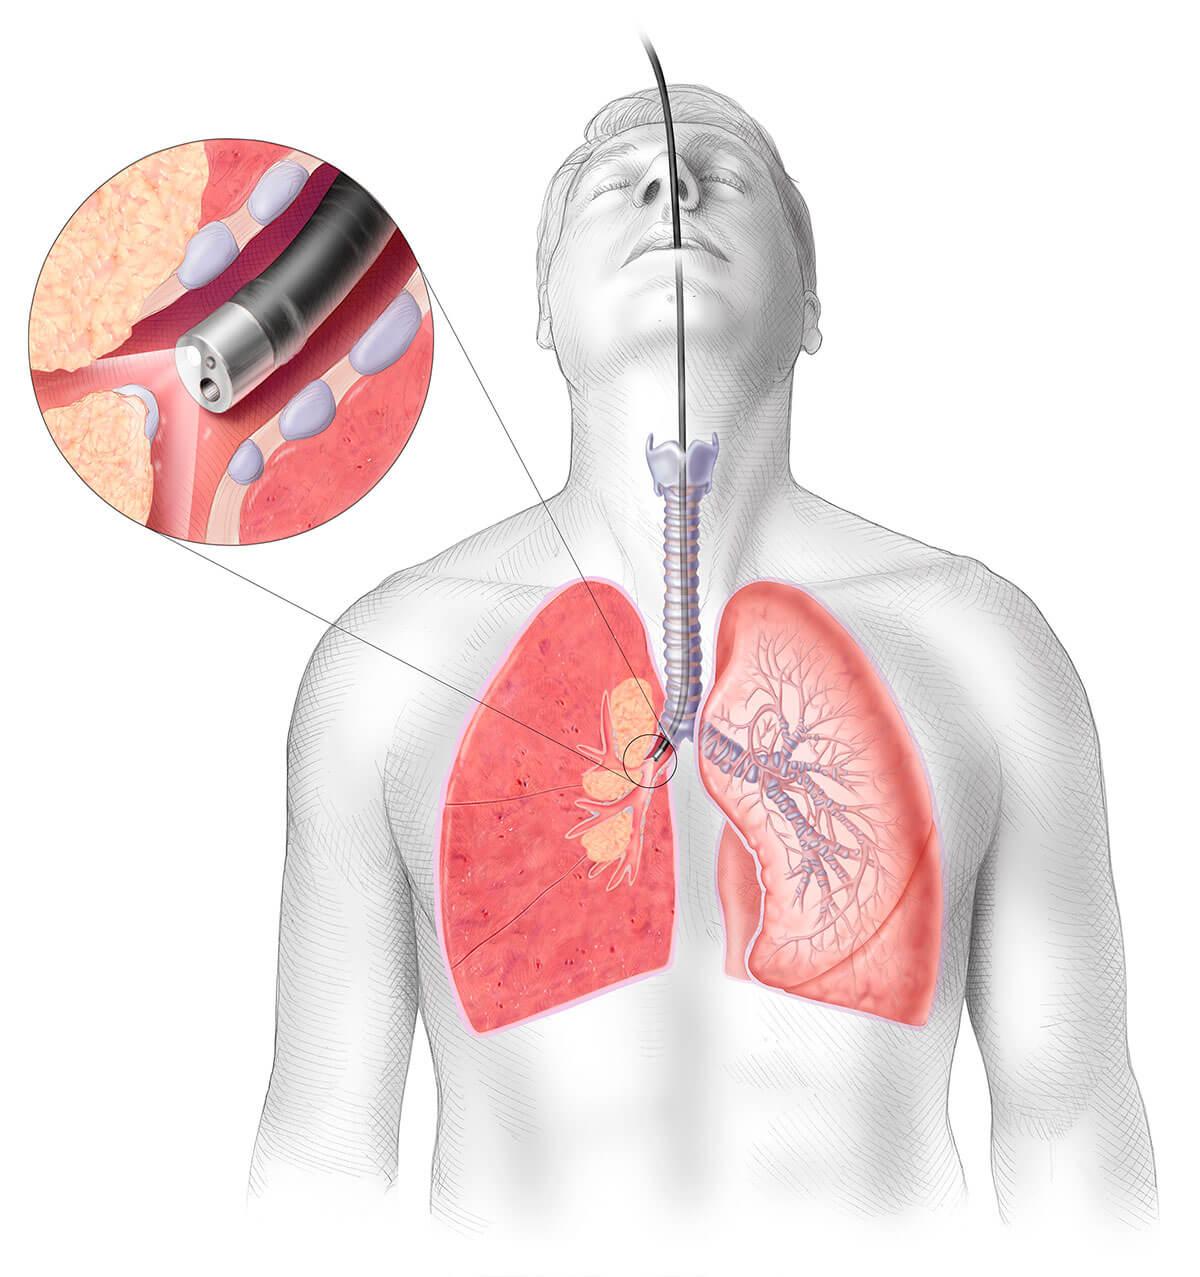 cyste på lungen